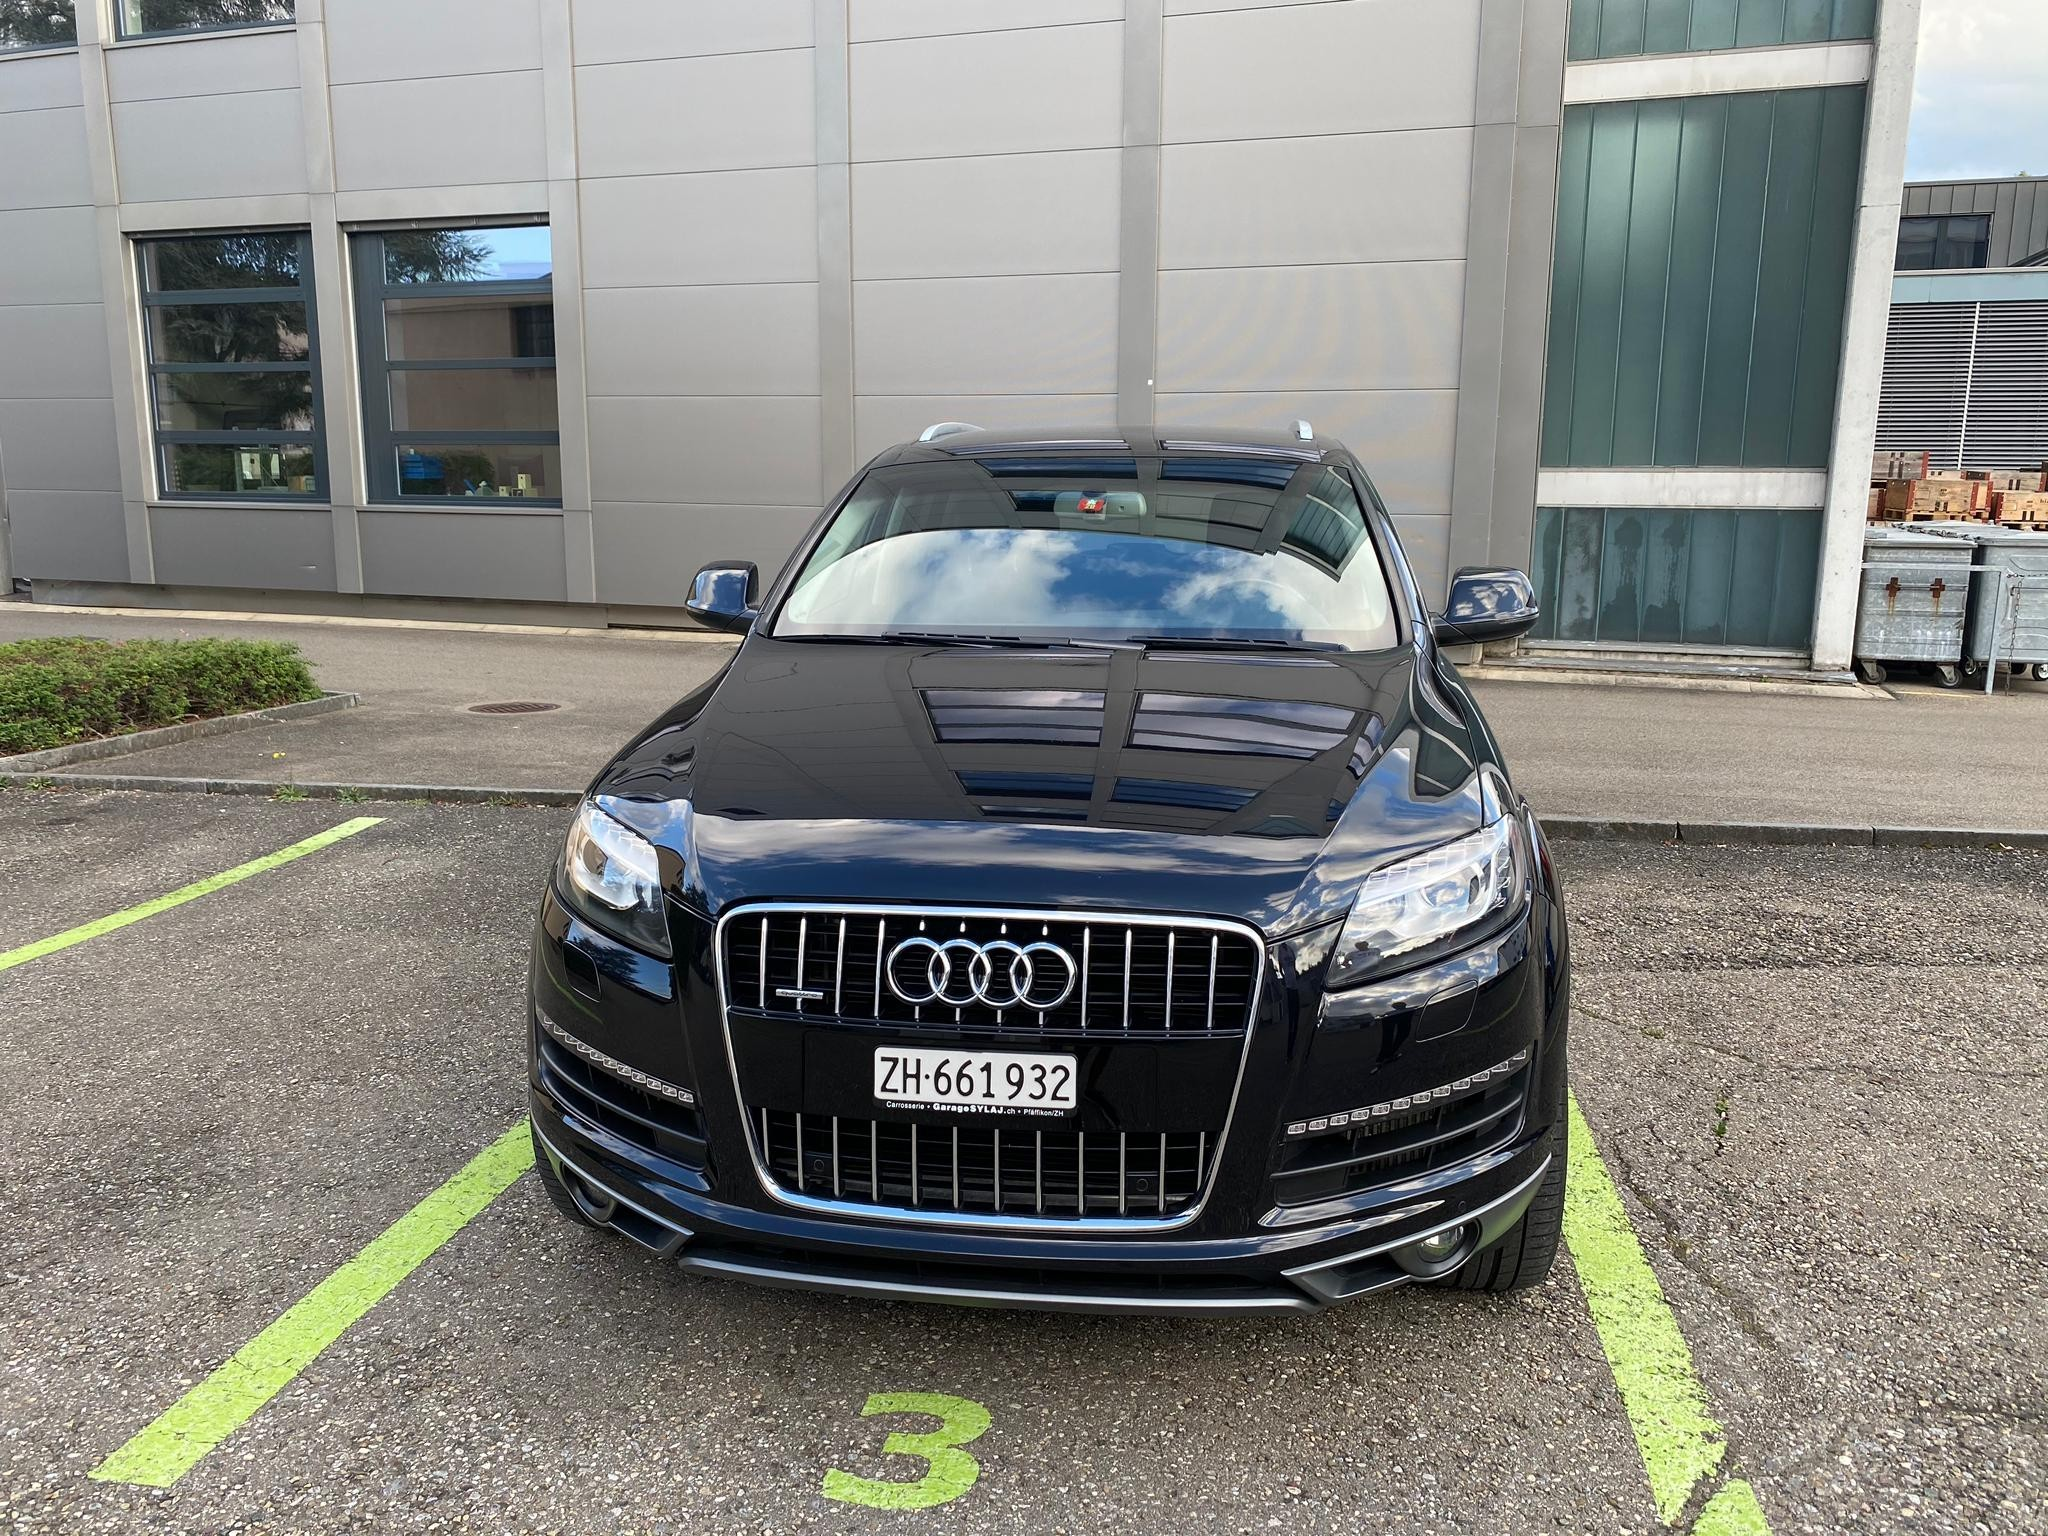 suv Audi Q7 Audi Q7